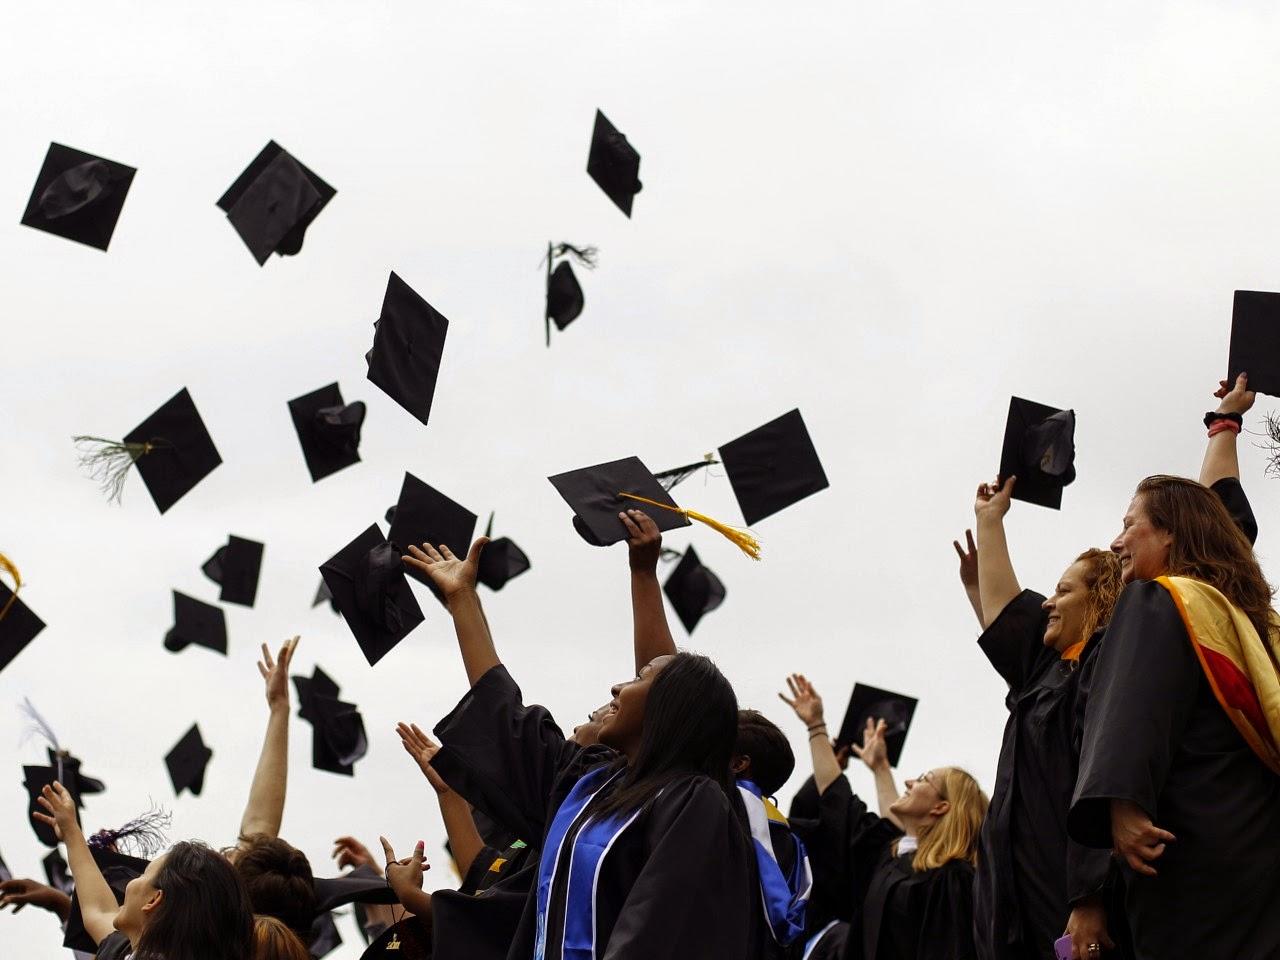 Come superare paura discussione tesi laurea